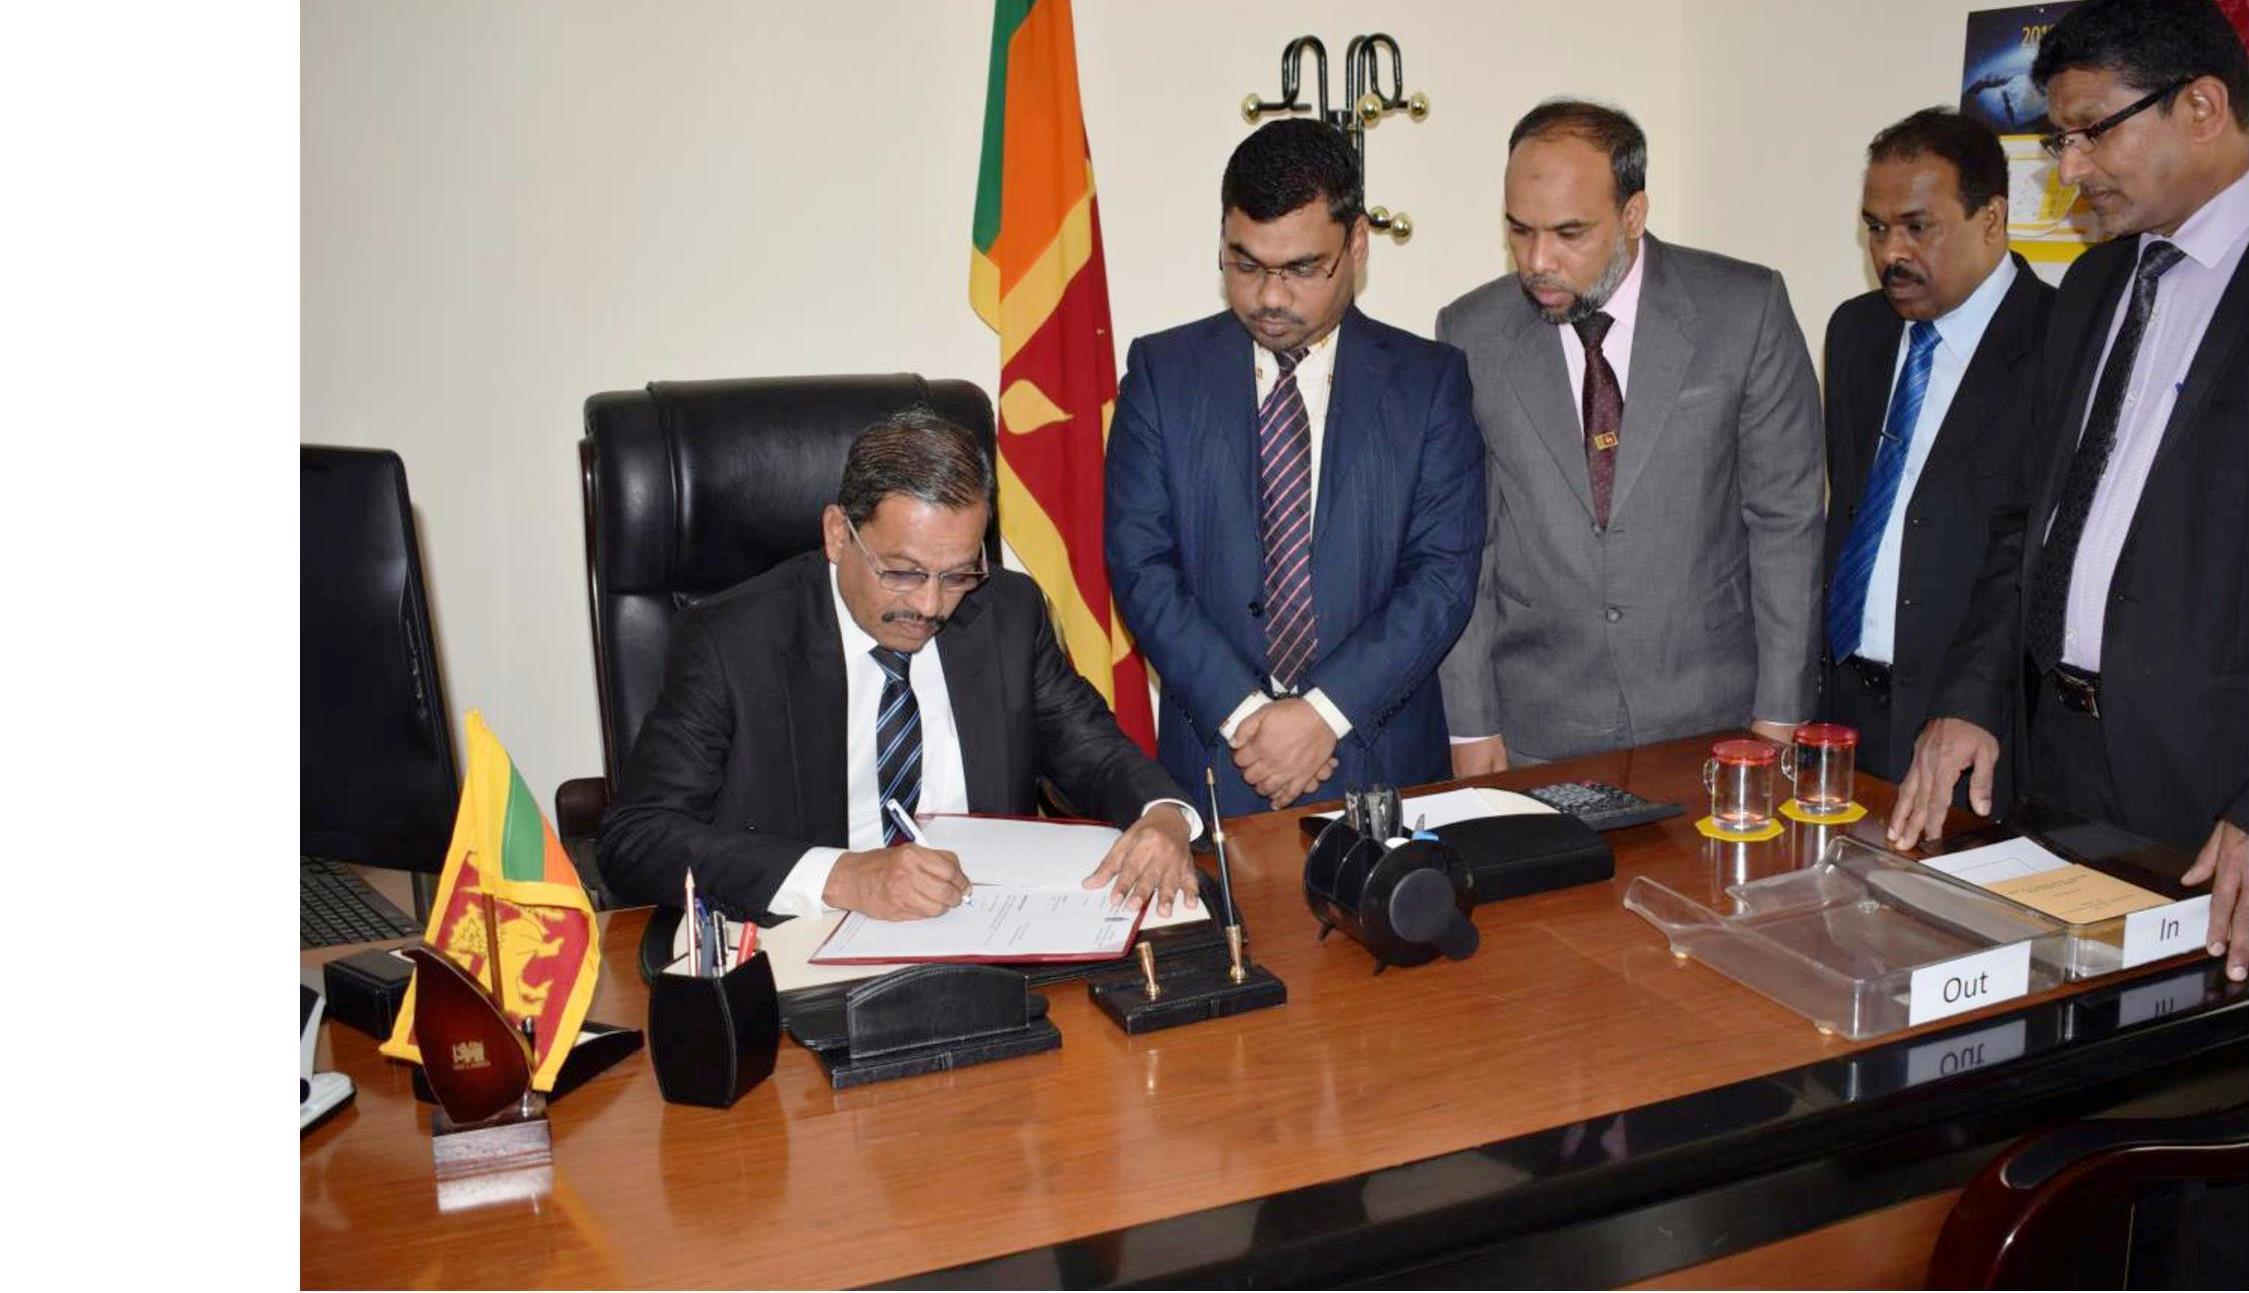 Consul General of Sri Lanka assumes duties in Jeddah, Saudi Arabia